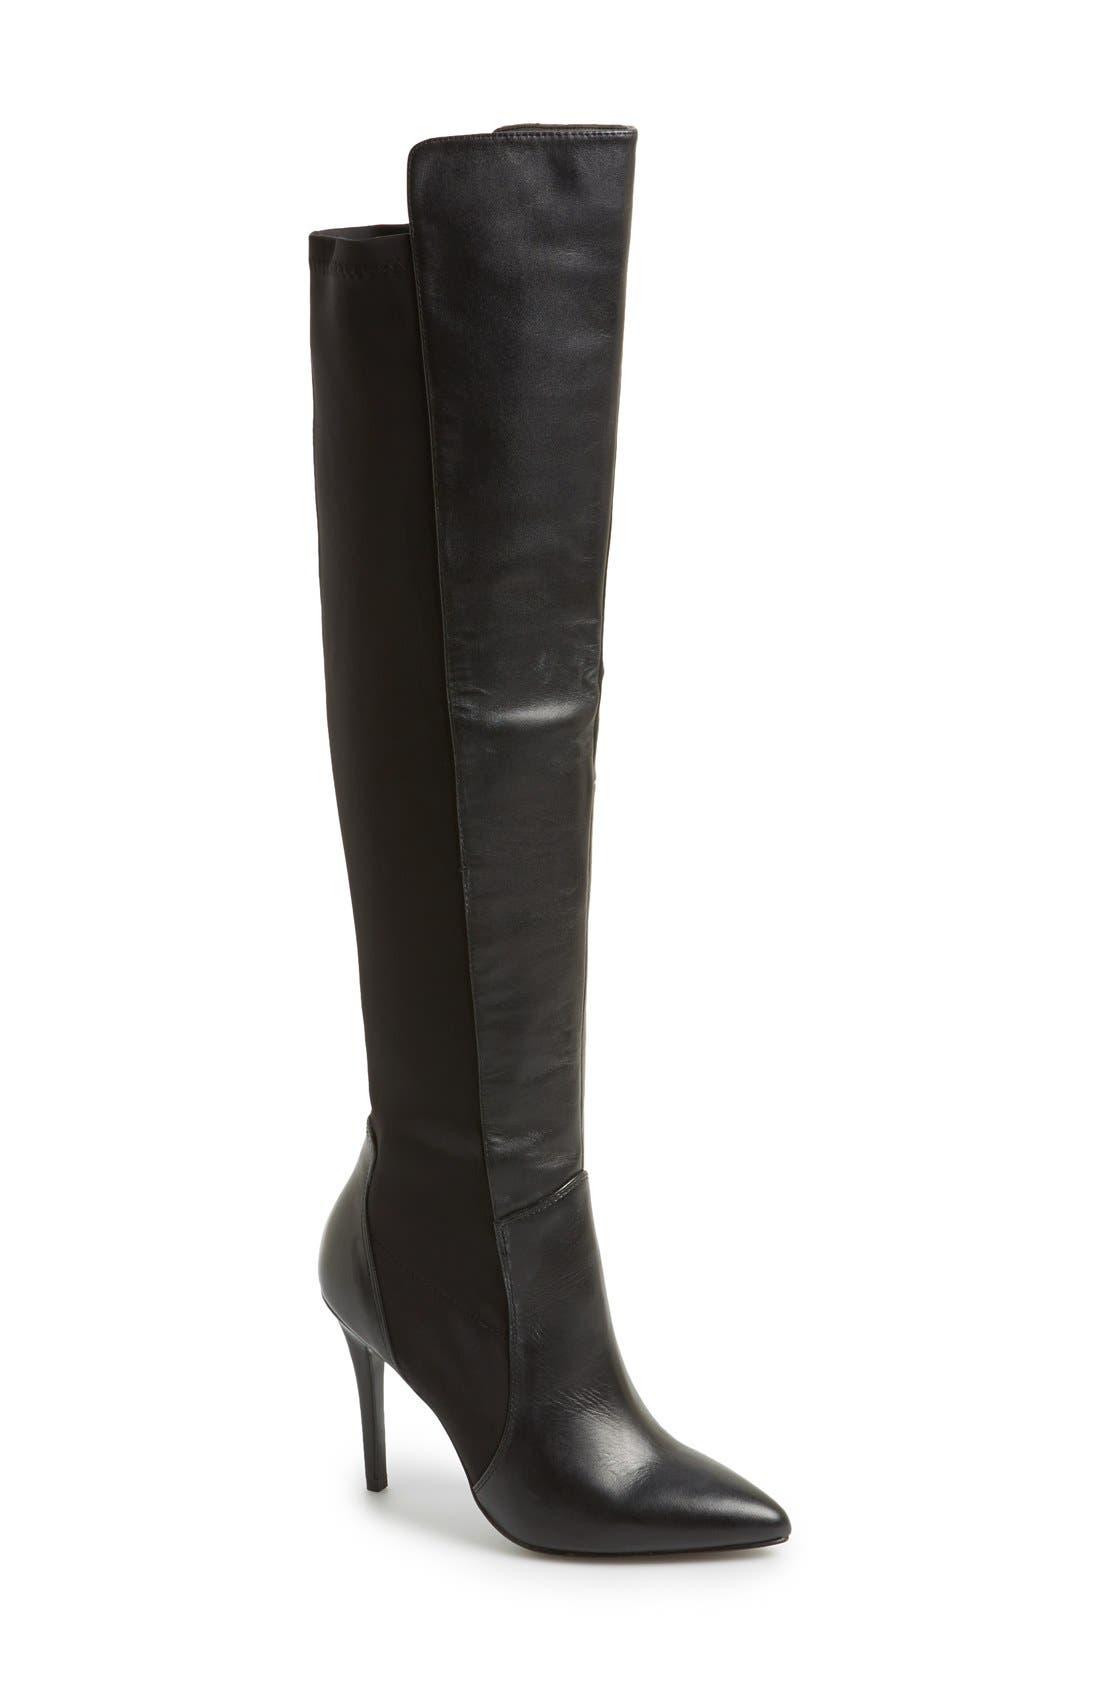 Main Image - Charles David 'Persona' Tall Boot (Women)